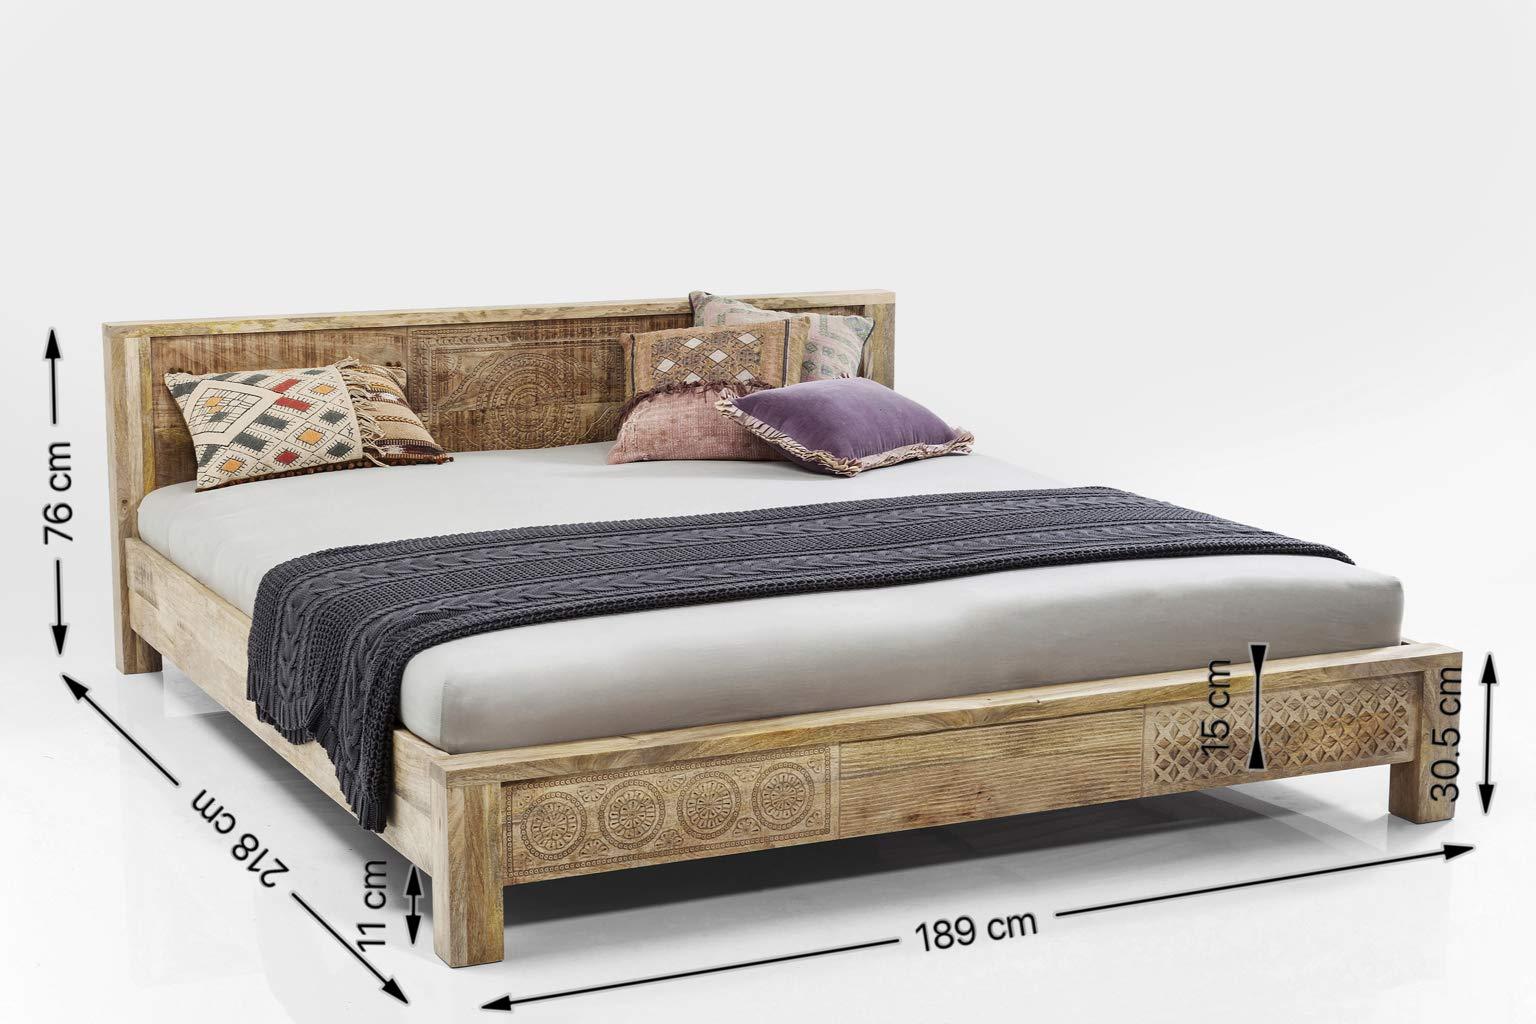 Full Size of Palettenbett Ikea Lipa Bett Holz Massivholzbett 90 100 120 140 160 180 Betten 160x200 Modulküche Küche Kosten Kaufen Bei Miniküche Sofa Mit Schlaffunktion Wohnzimmer Palettenbett Ikea